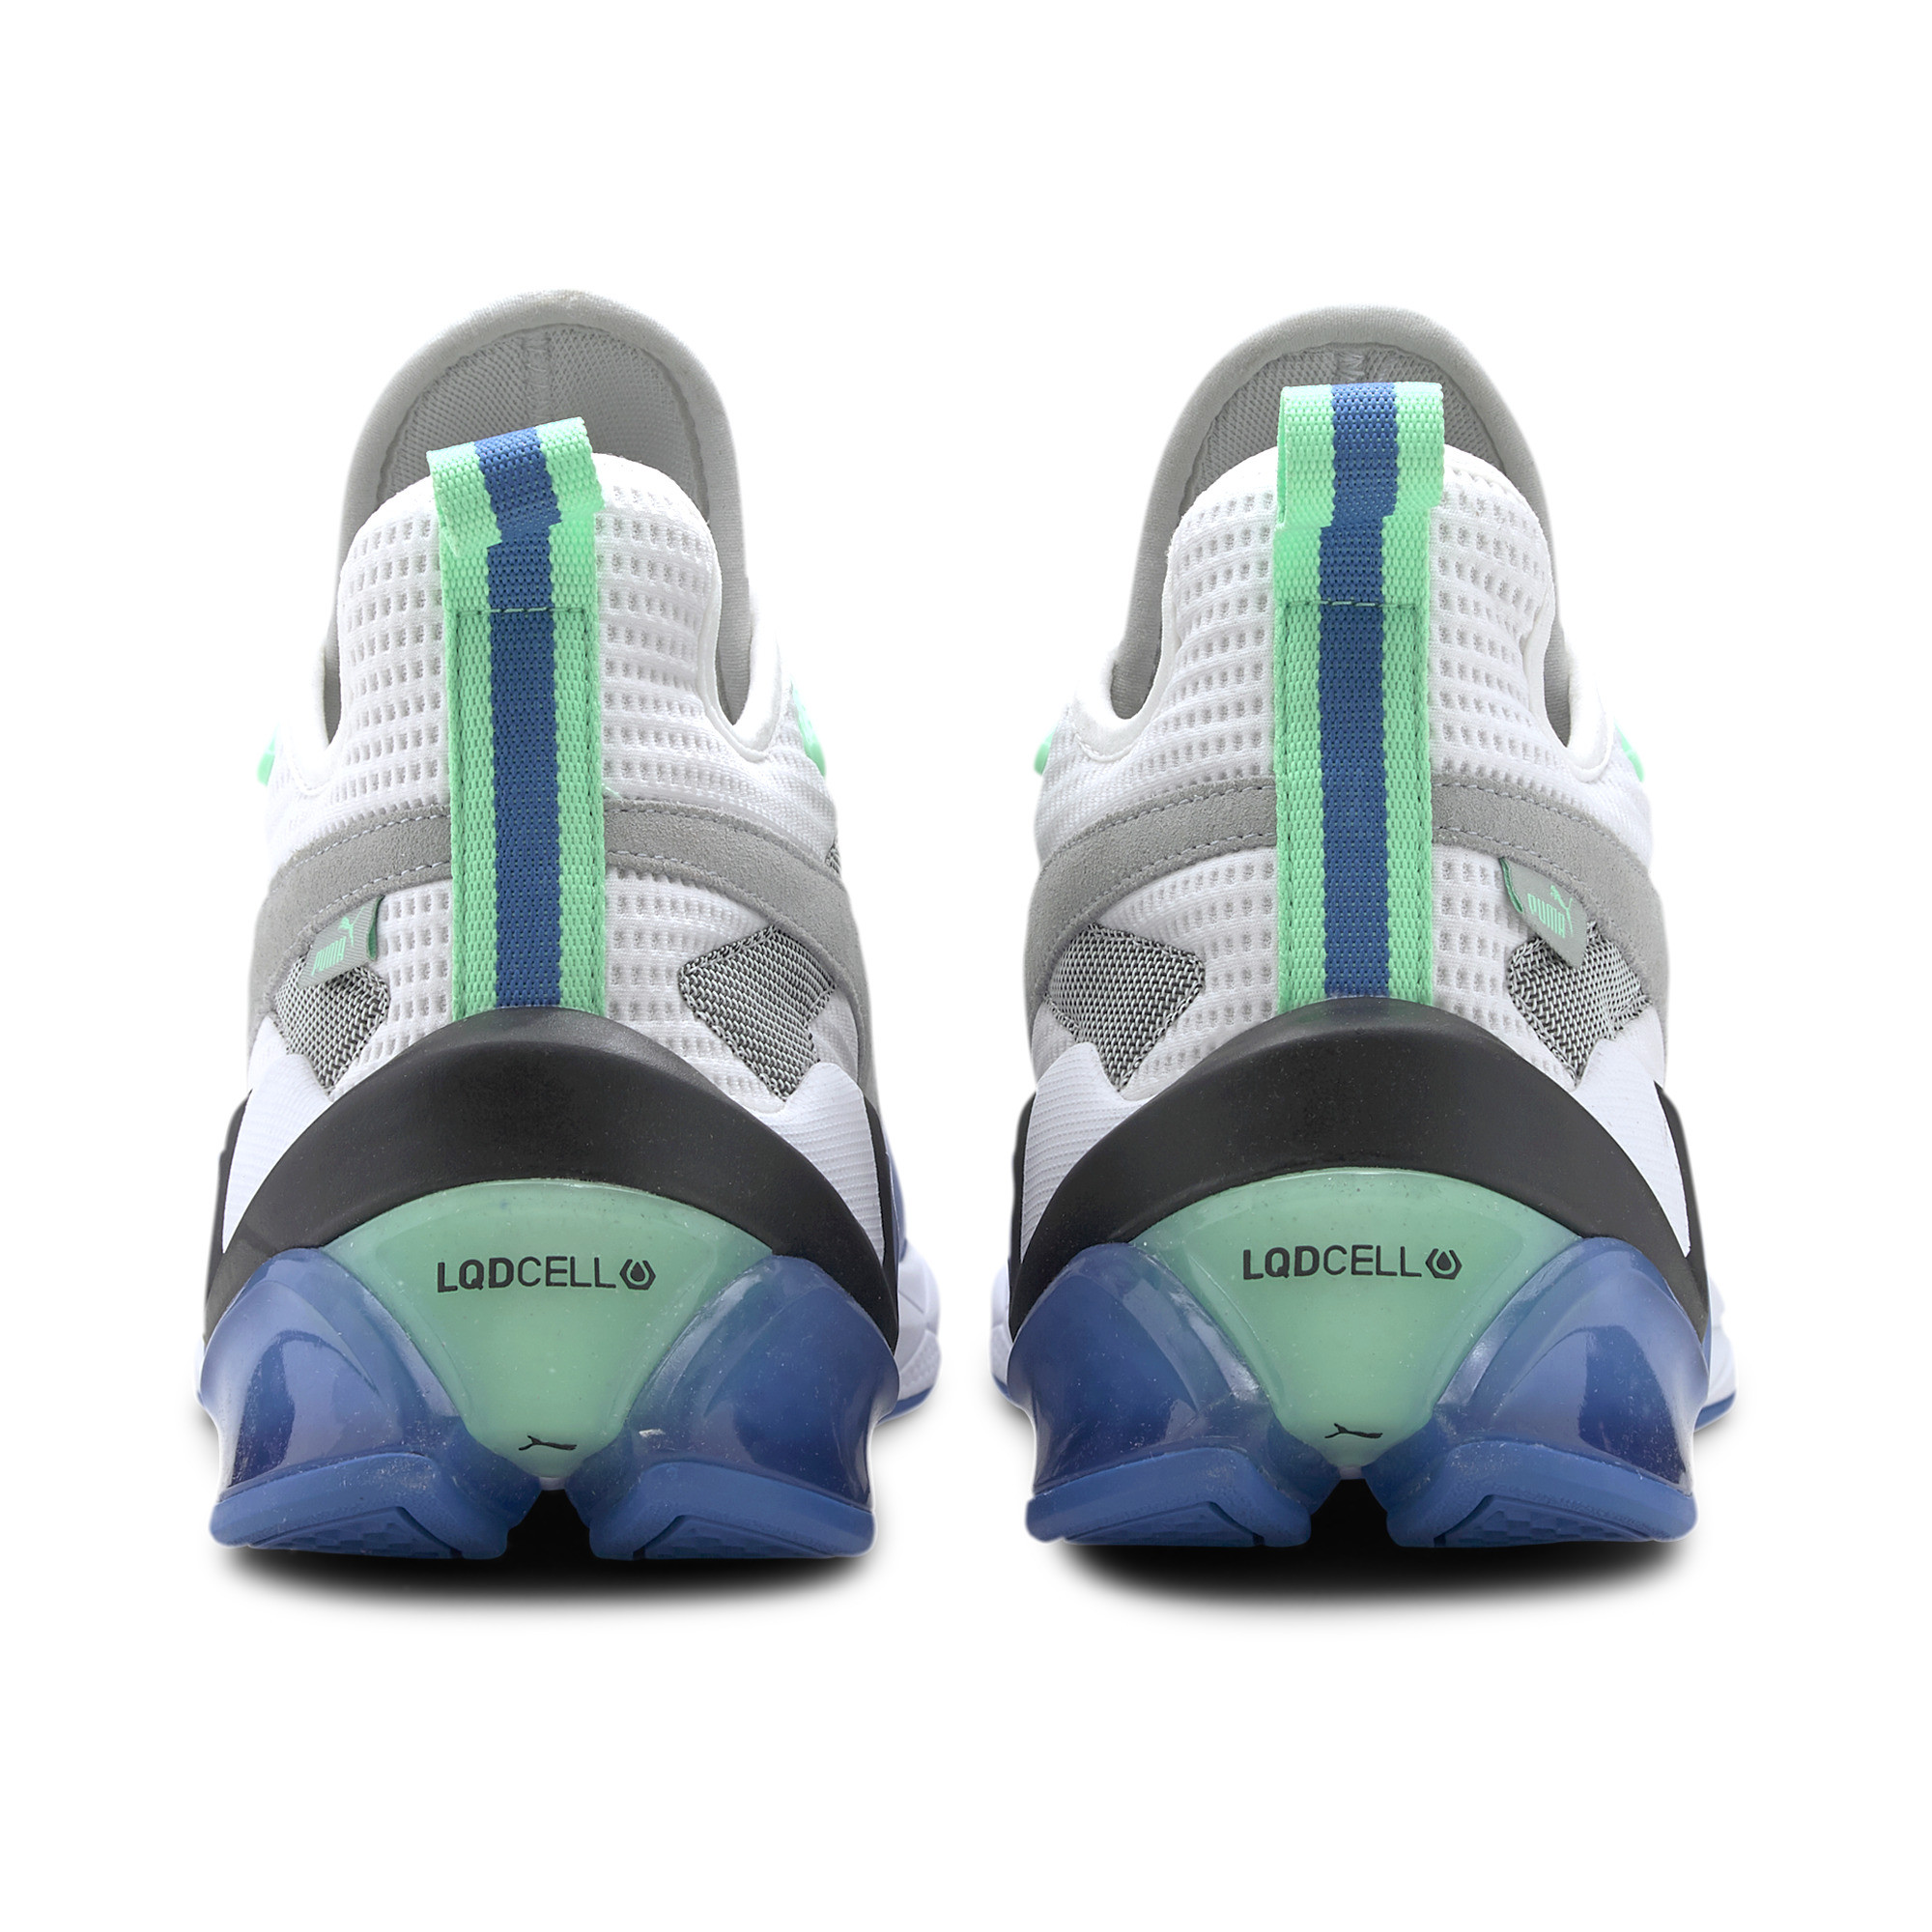 PUMA-Men-039-s-LQDCELL-Origin-Training-Shoes thumbnail 17